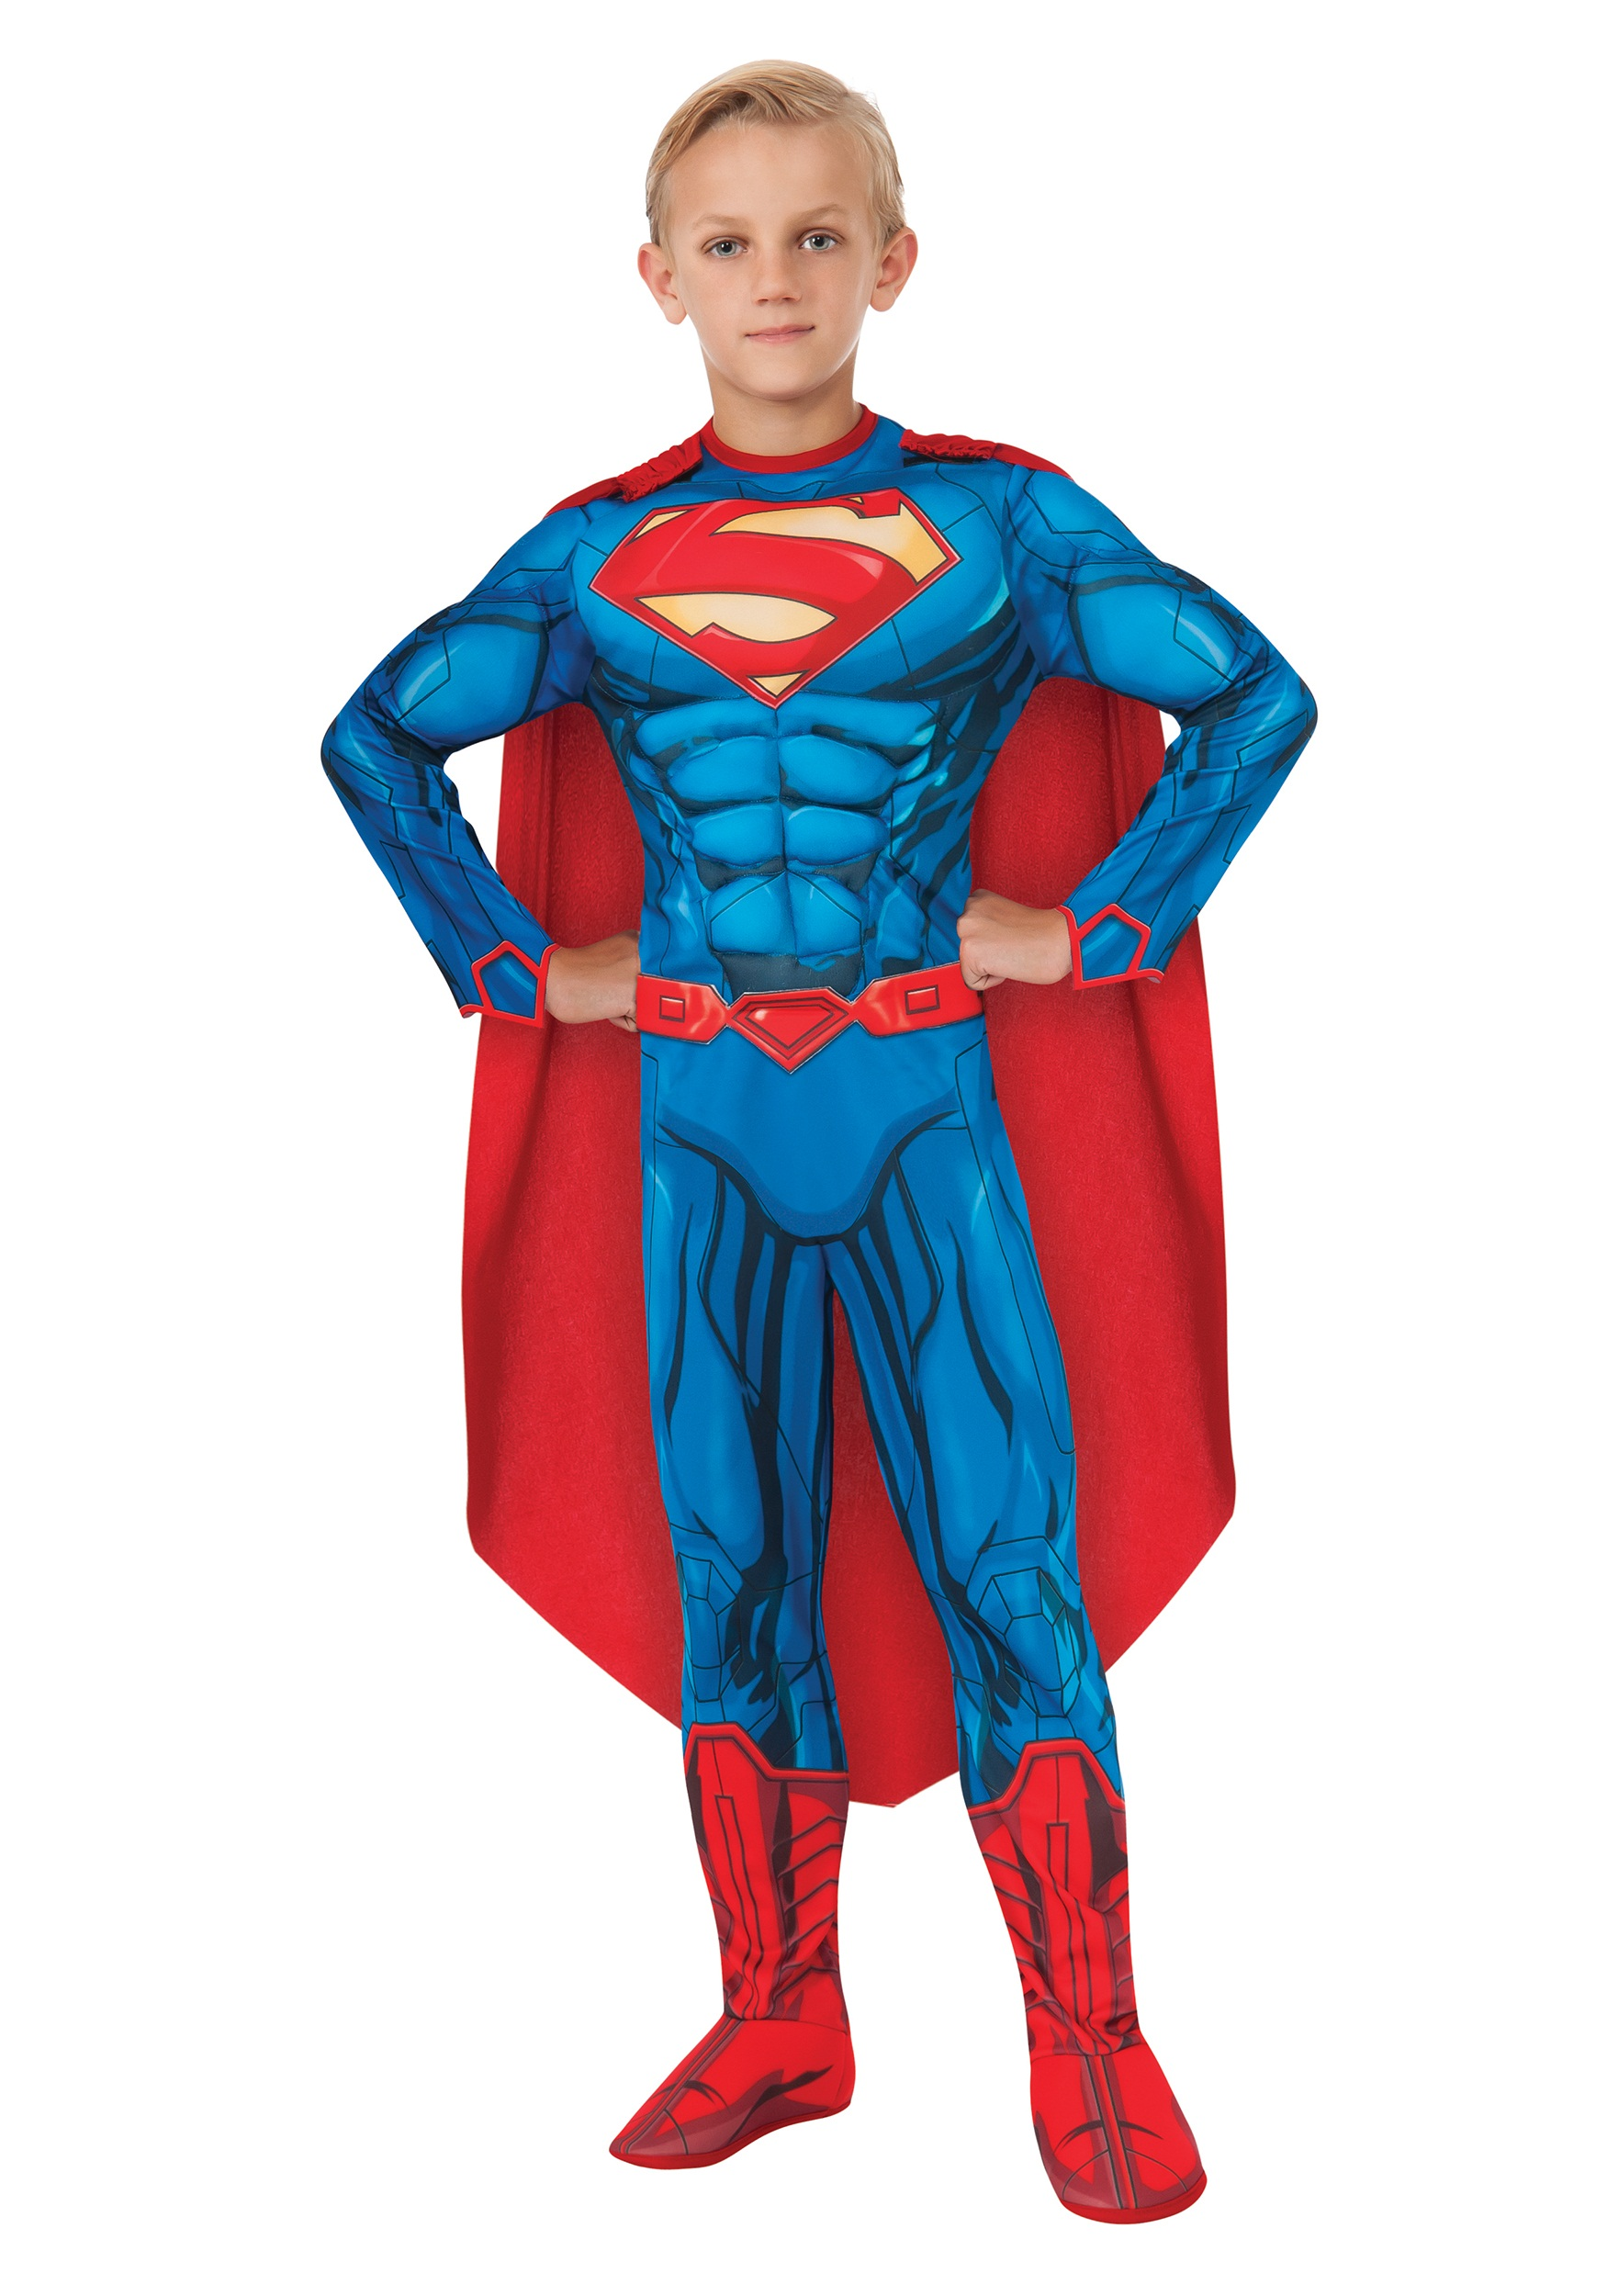 Deluxe Child Superman Costume  sc 1 st  Halloween Costumes & Deluxe Child Superman Costume - Halloween Costumes